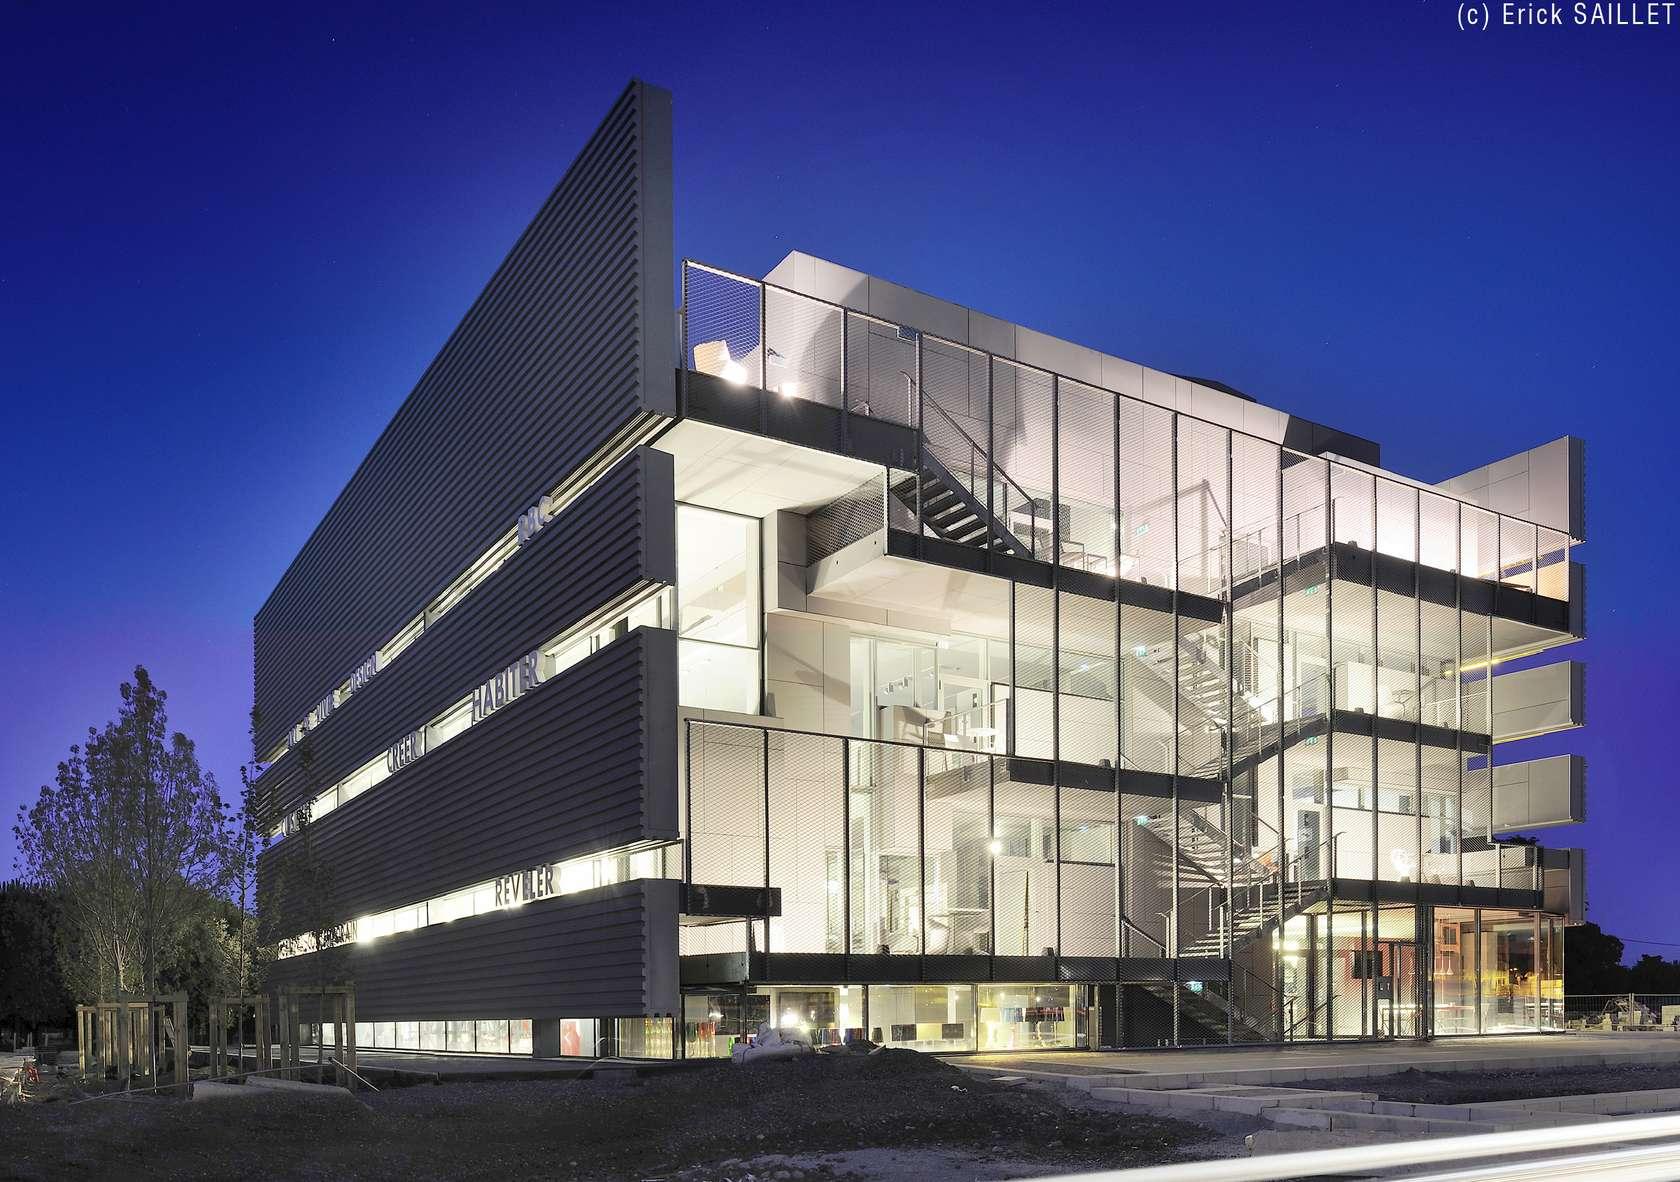 Rbc design center architizer for Jean nouvel design